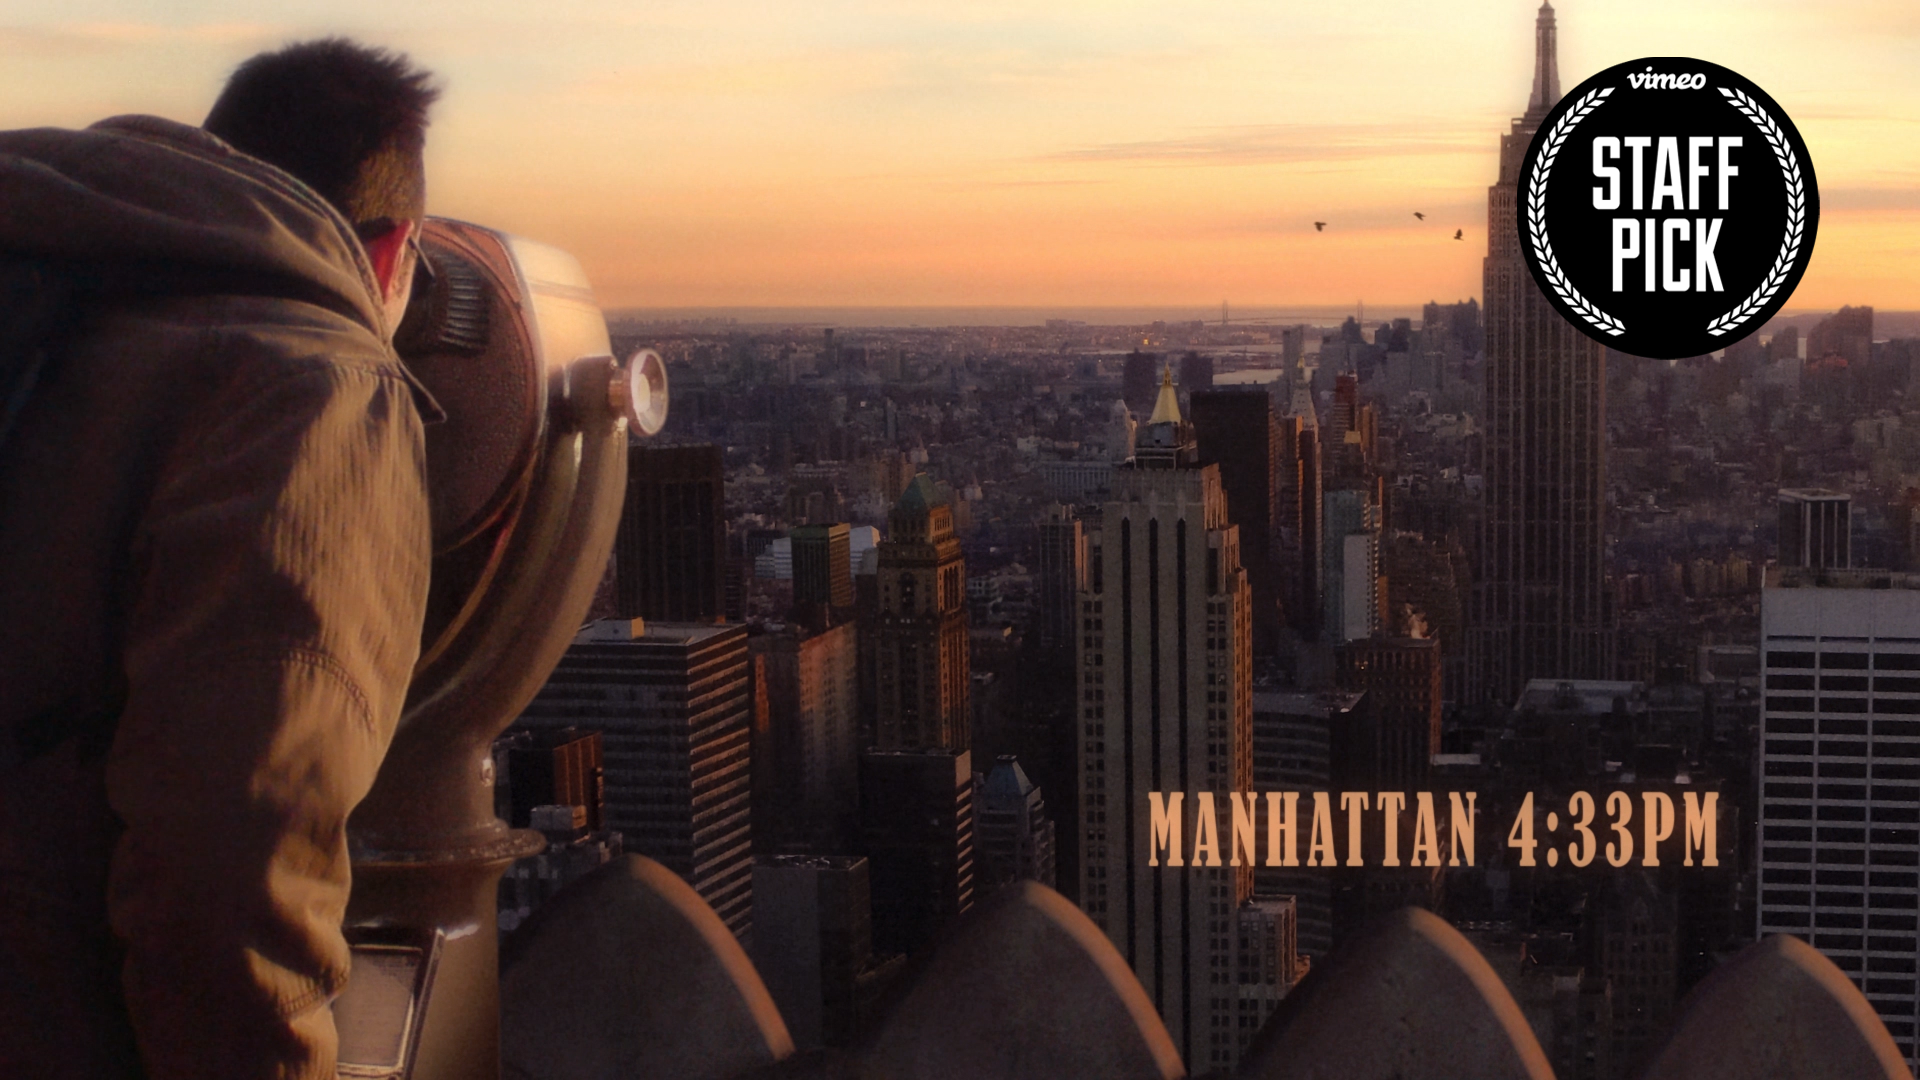 Manhattan 4.33pm by Lizzie Oxby